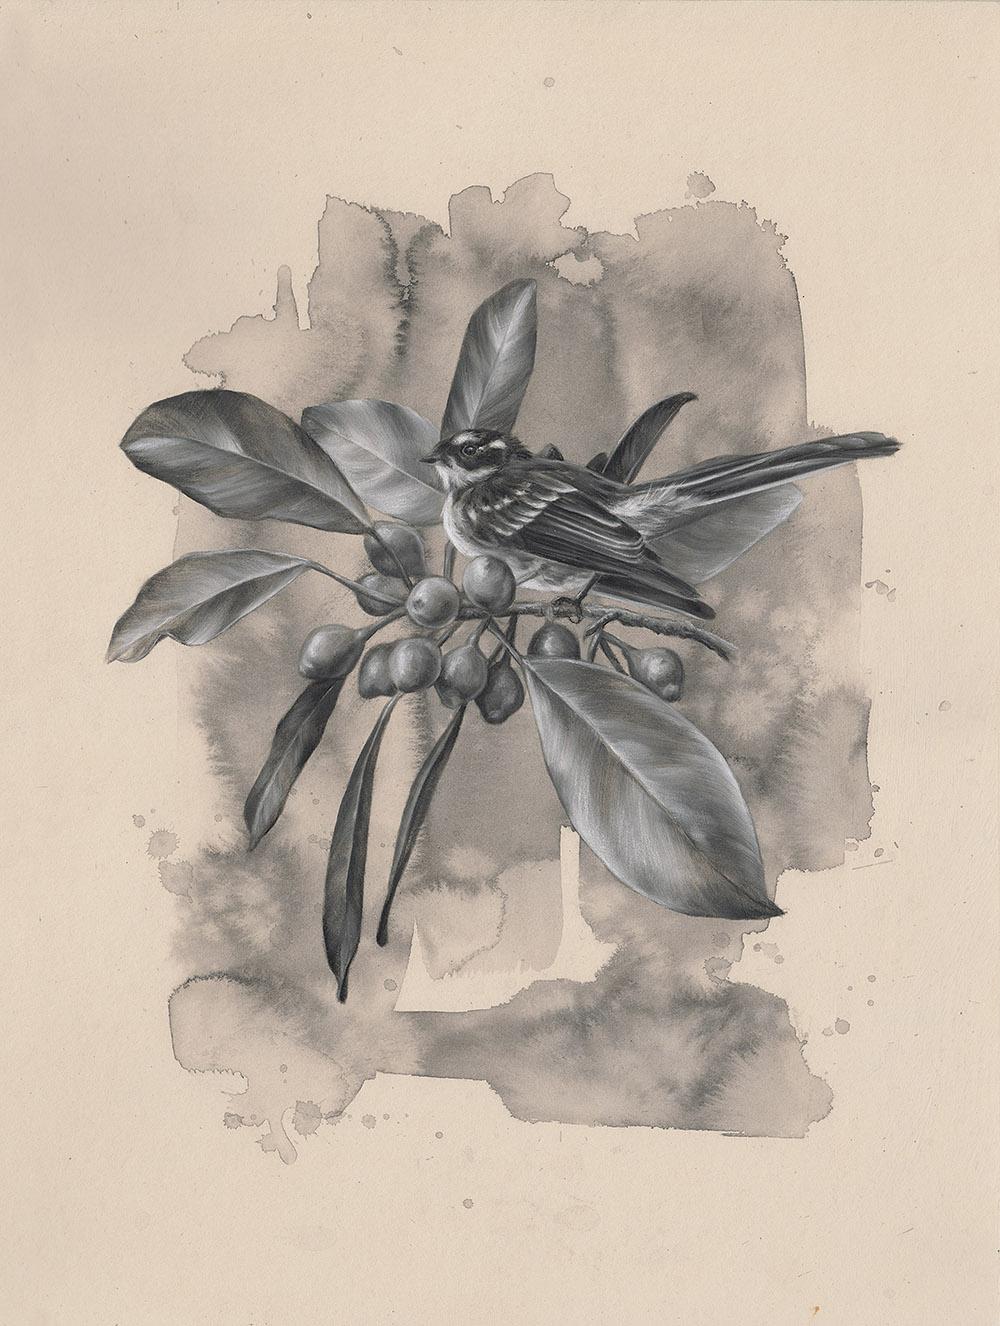 Grey Fantail: 6Series 1.2